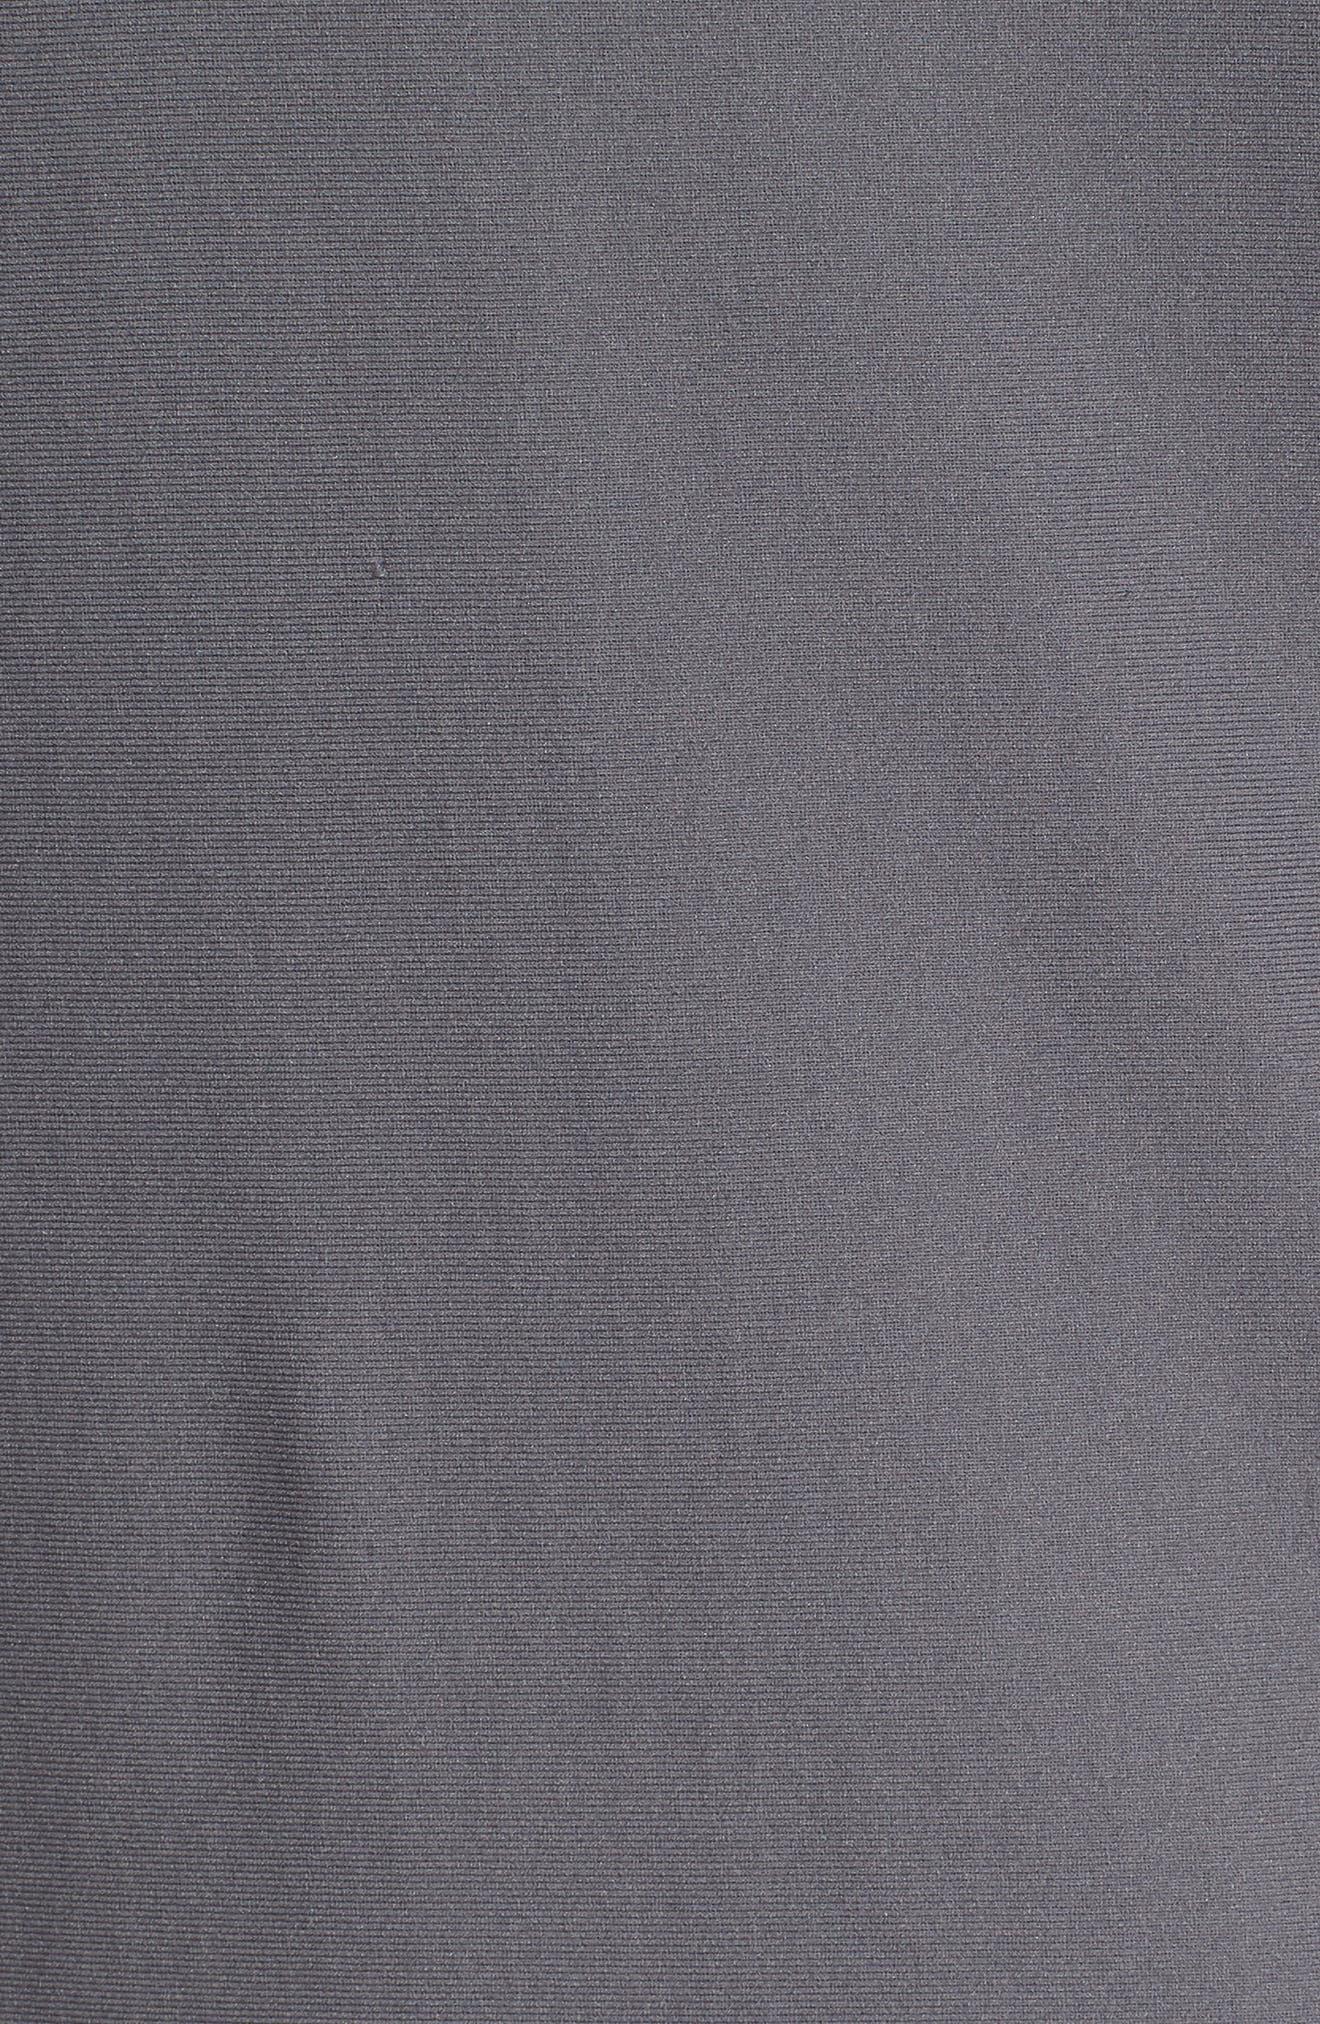 Threadborne Vanish Vest,                             Alternate thumbnail 5, color,                             Anthracite / Graphite/ Iron